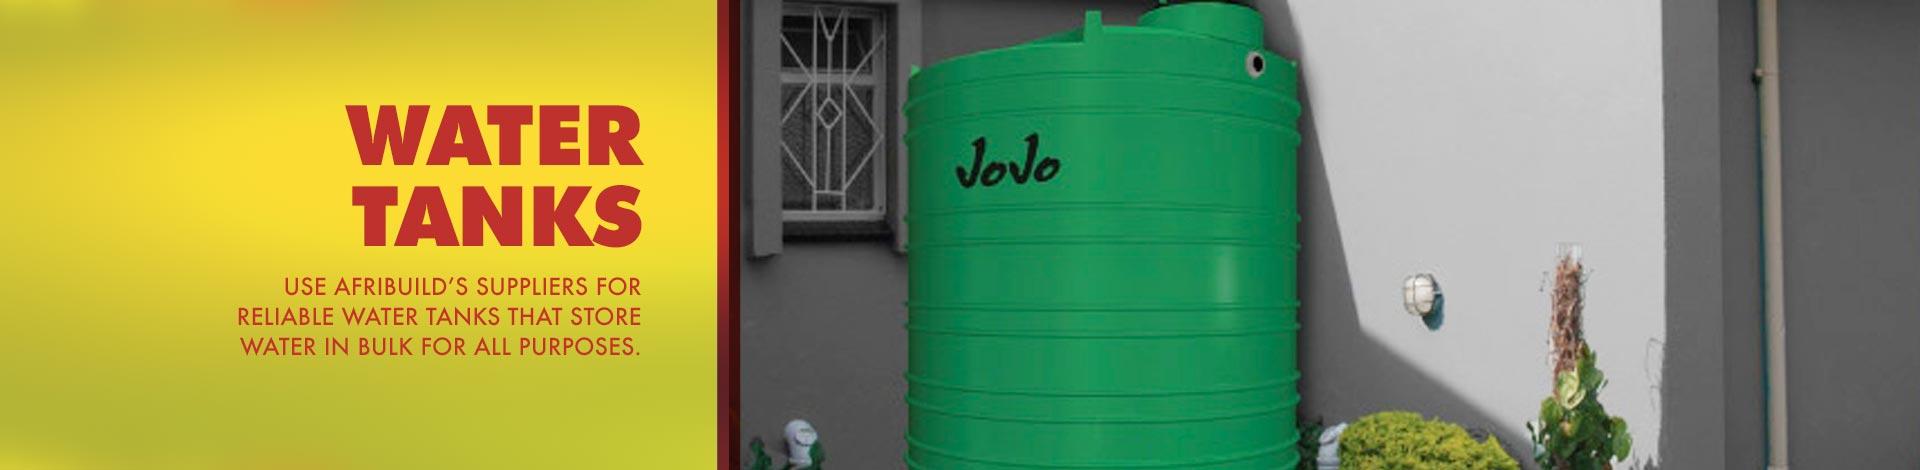 Afribuild Water Tanks